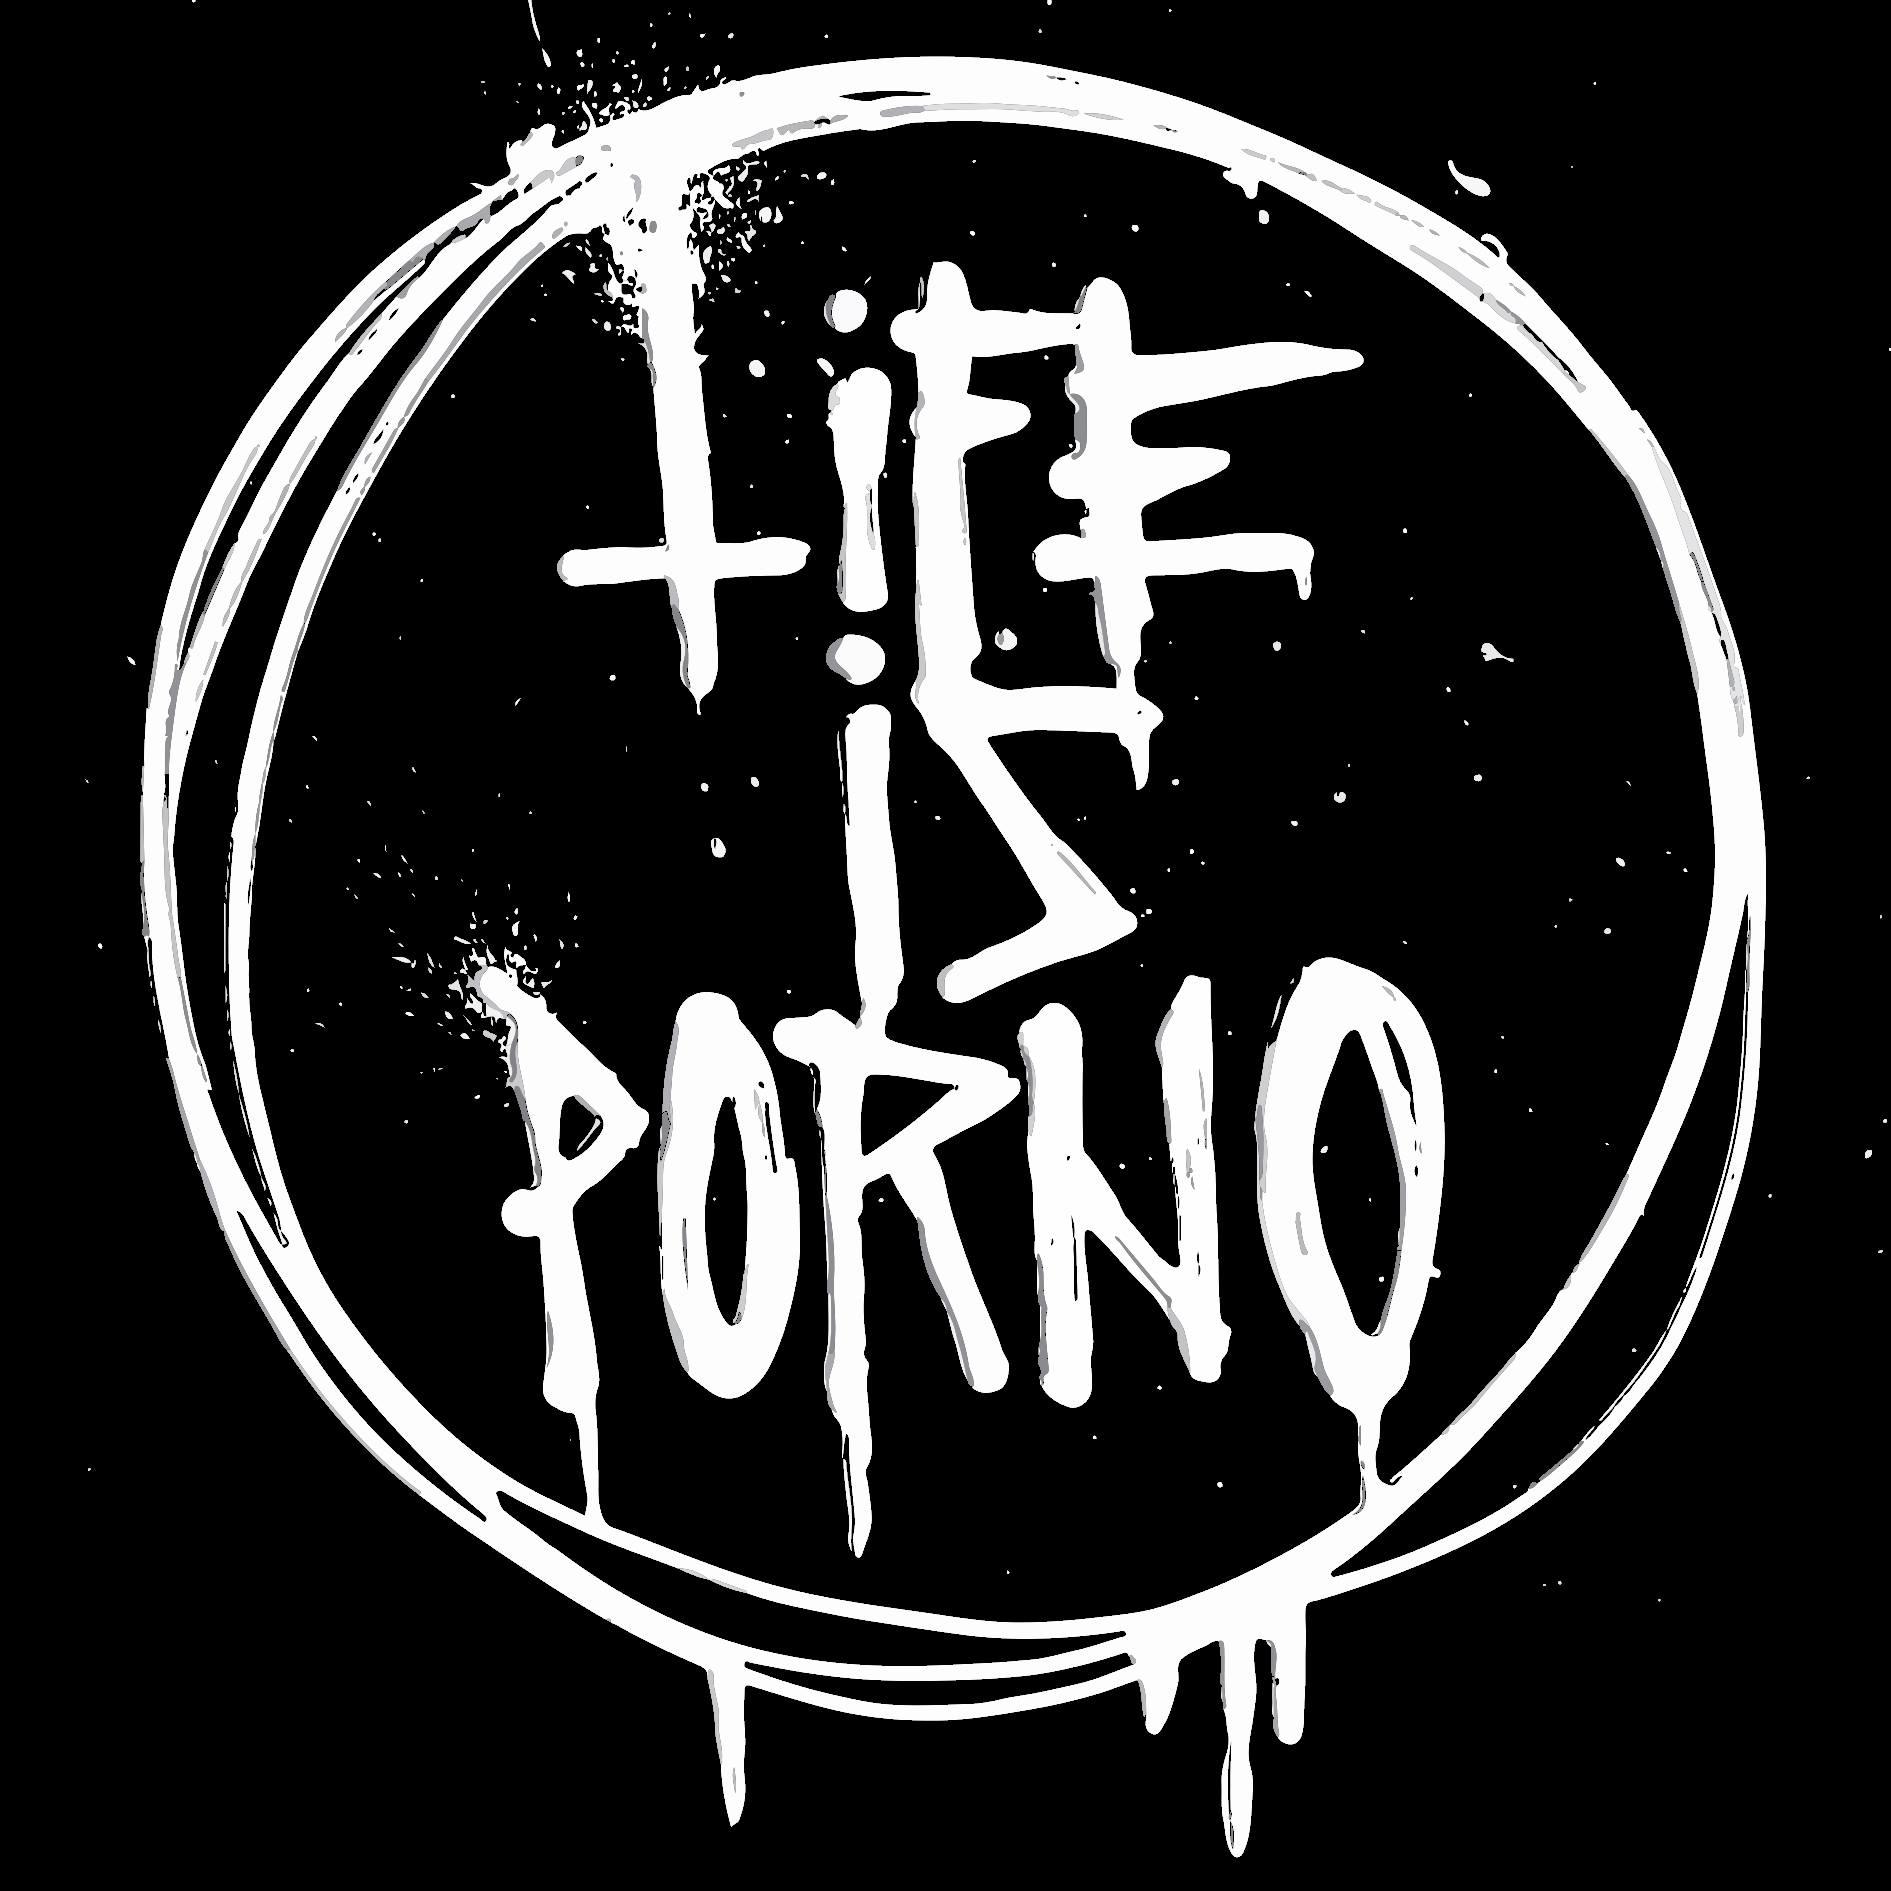 life-is-porno-projekt